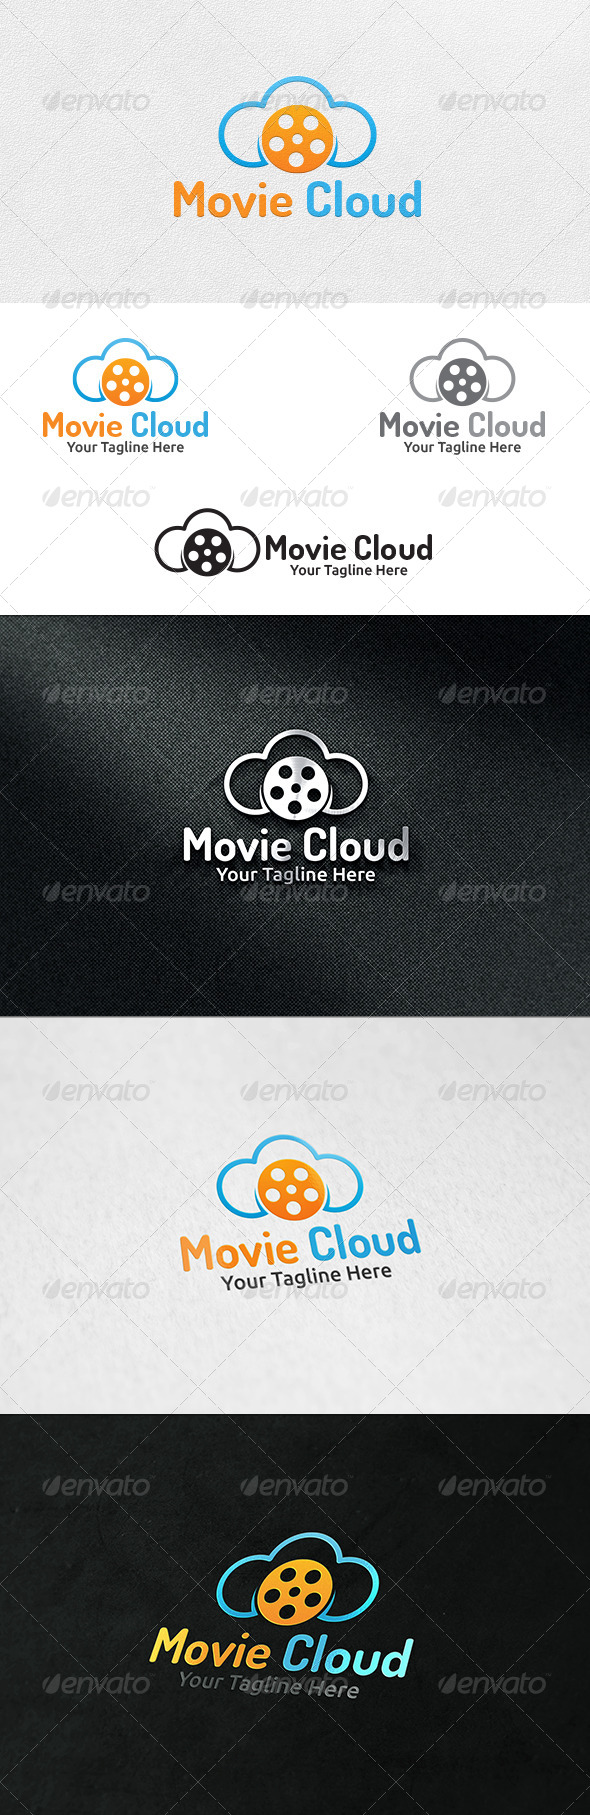 Cloud Movies - Logo Template - Symbols Logo Templates